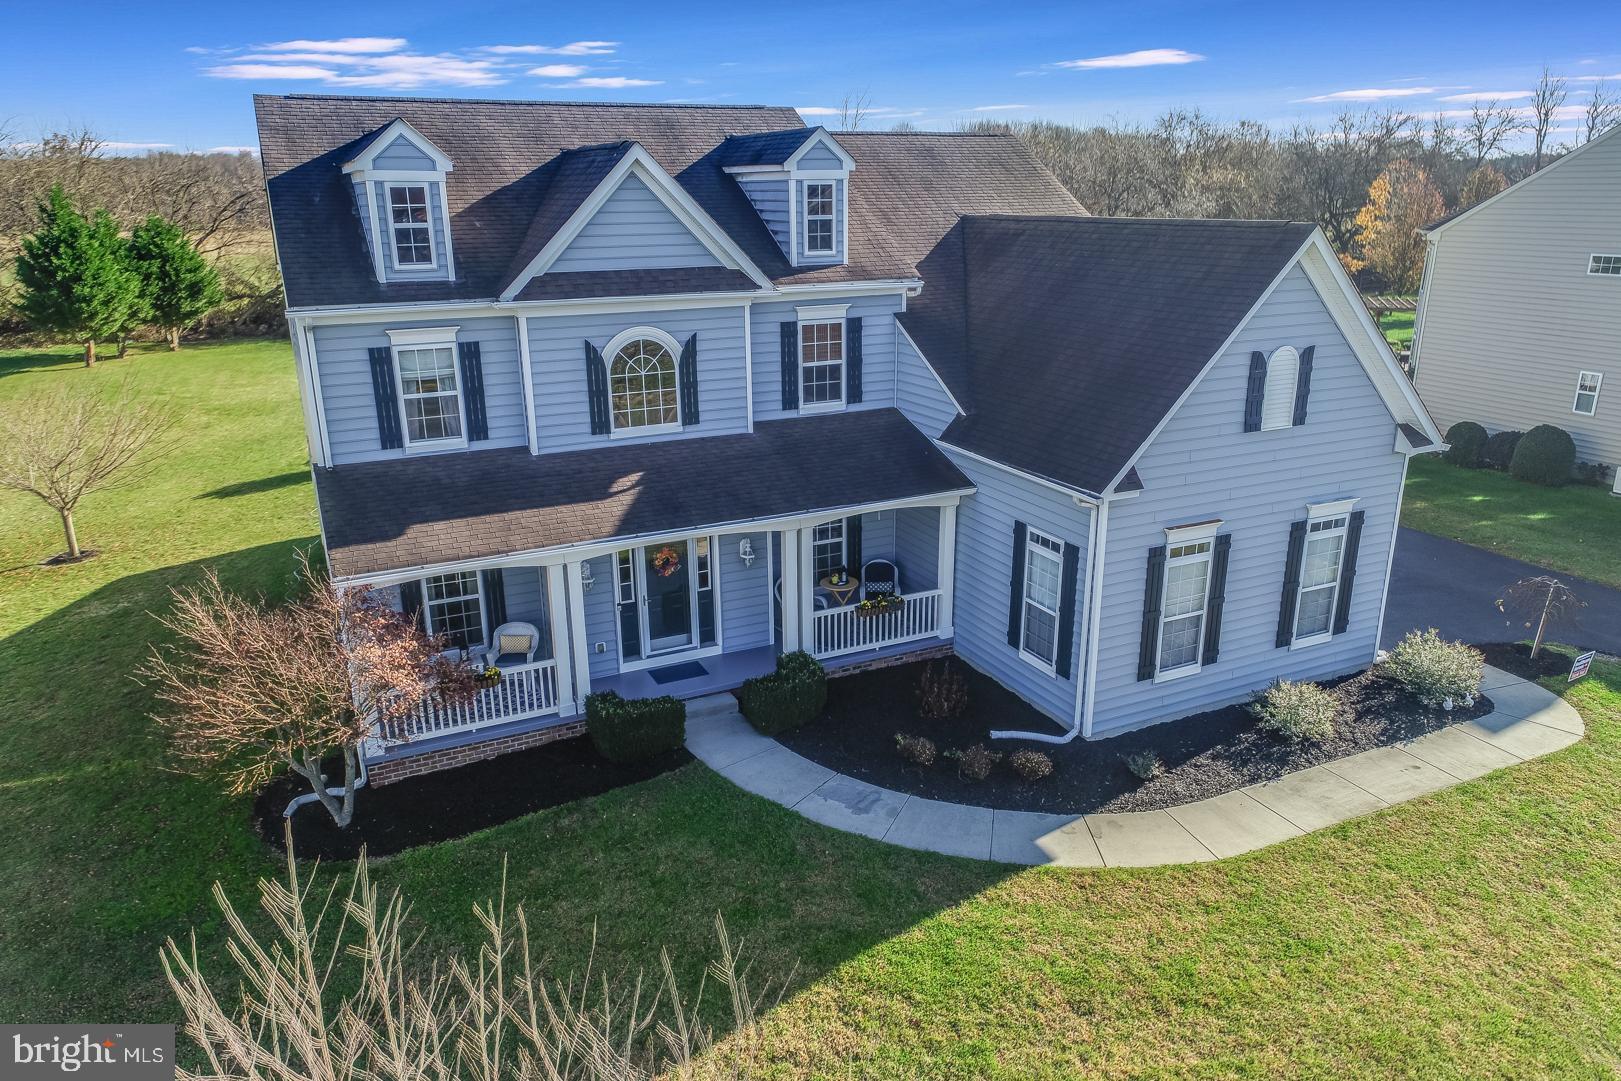 Visit this home virtually: http://www.vht.com/434123006/IDXS - Gorgeous Lexington with Classic Ameri